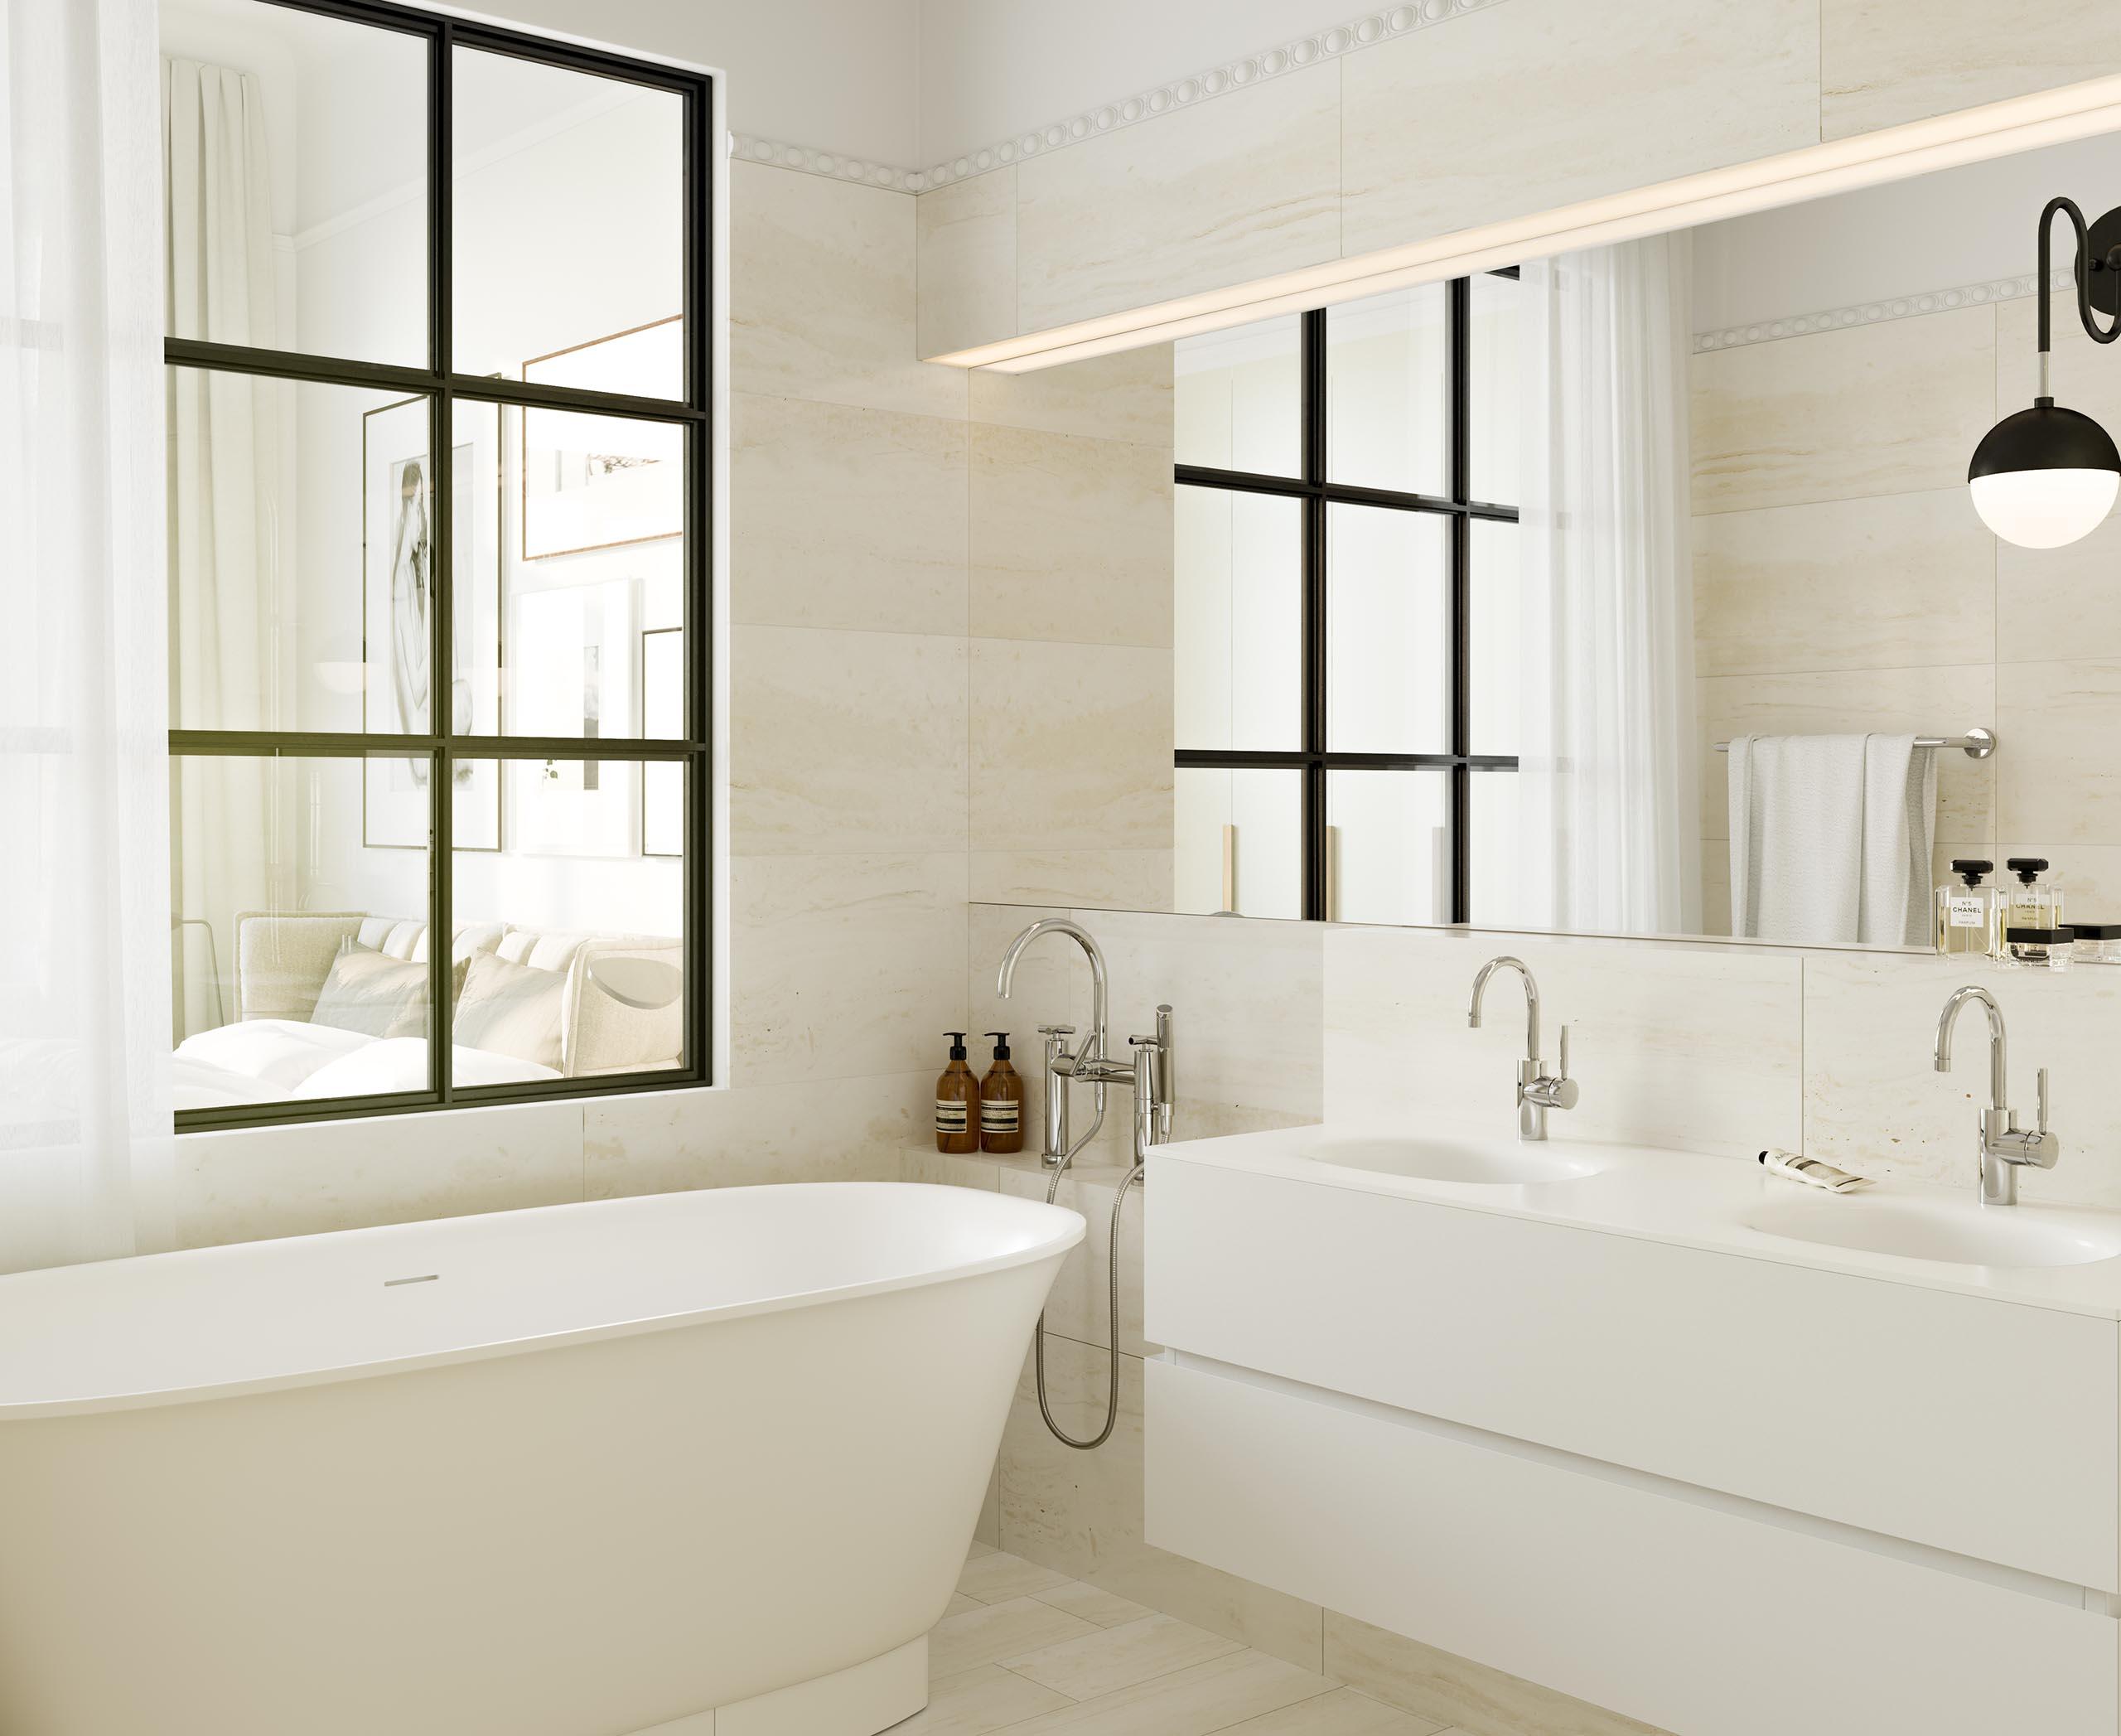 Luxury bathroom visualization